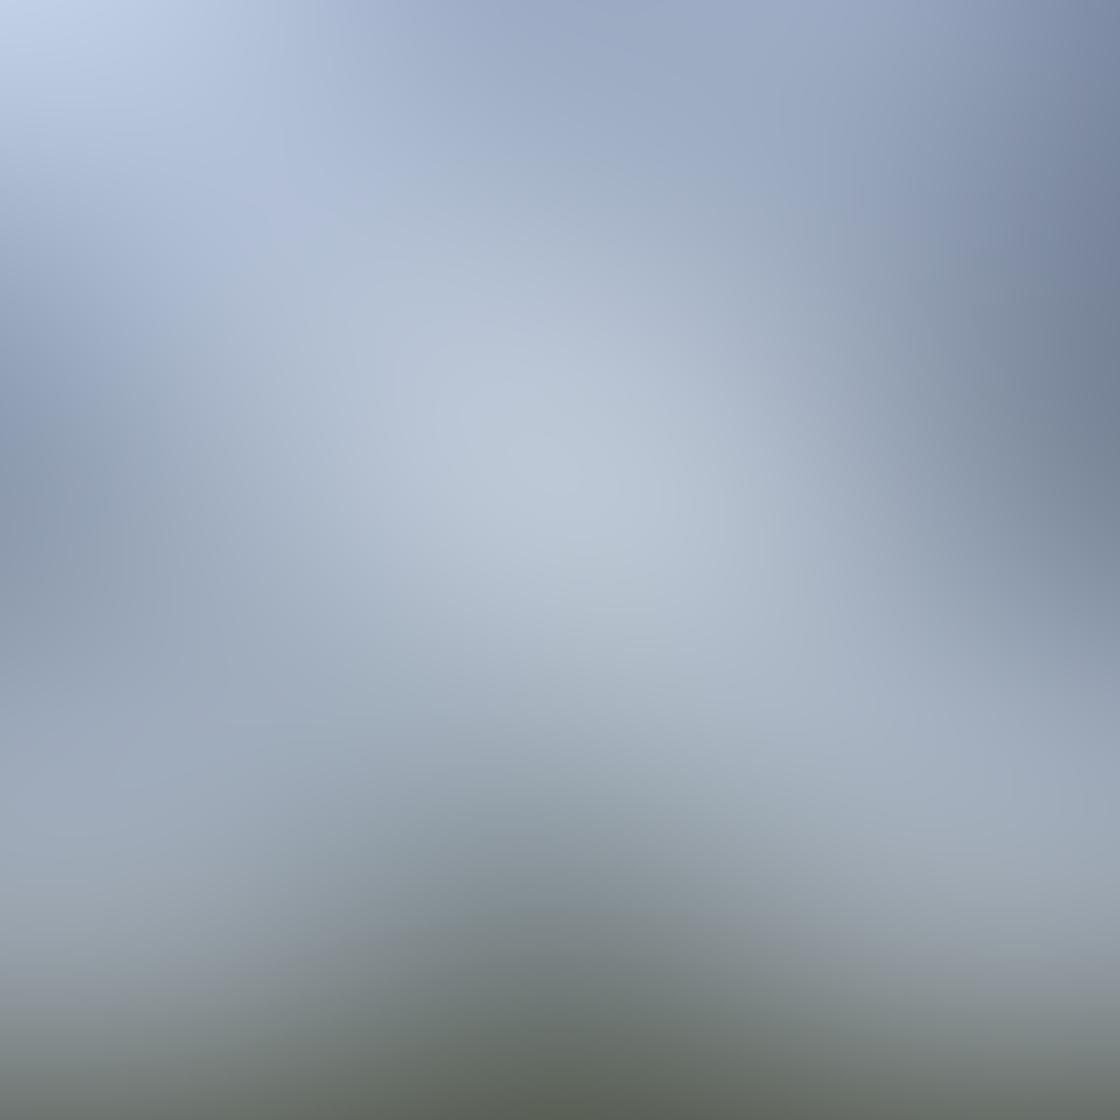 Minimalist Landscape iPhone Photos 26